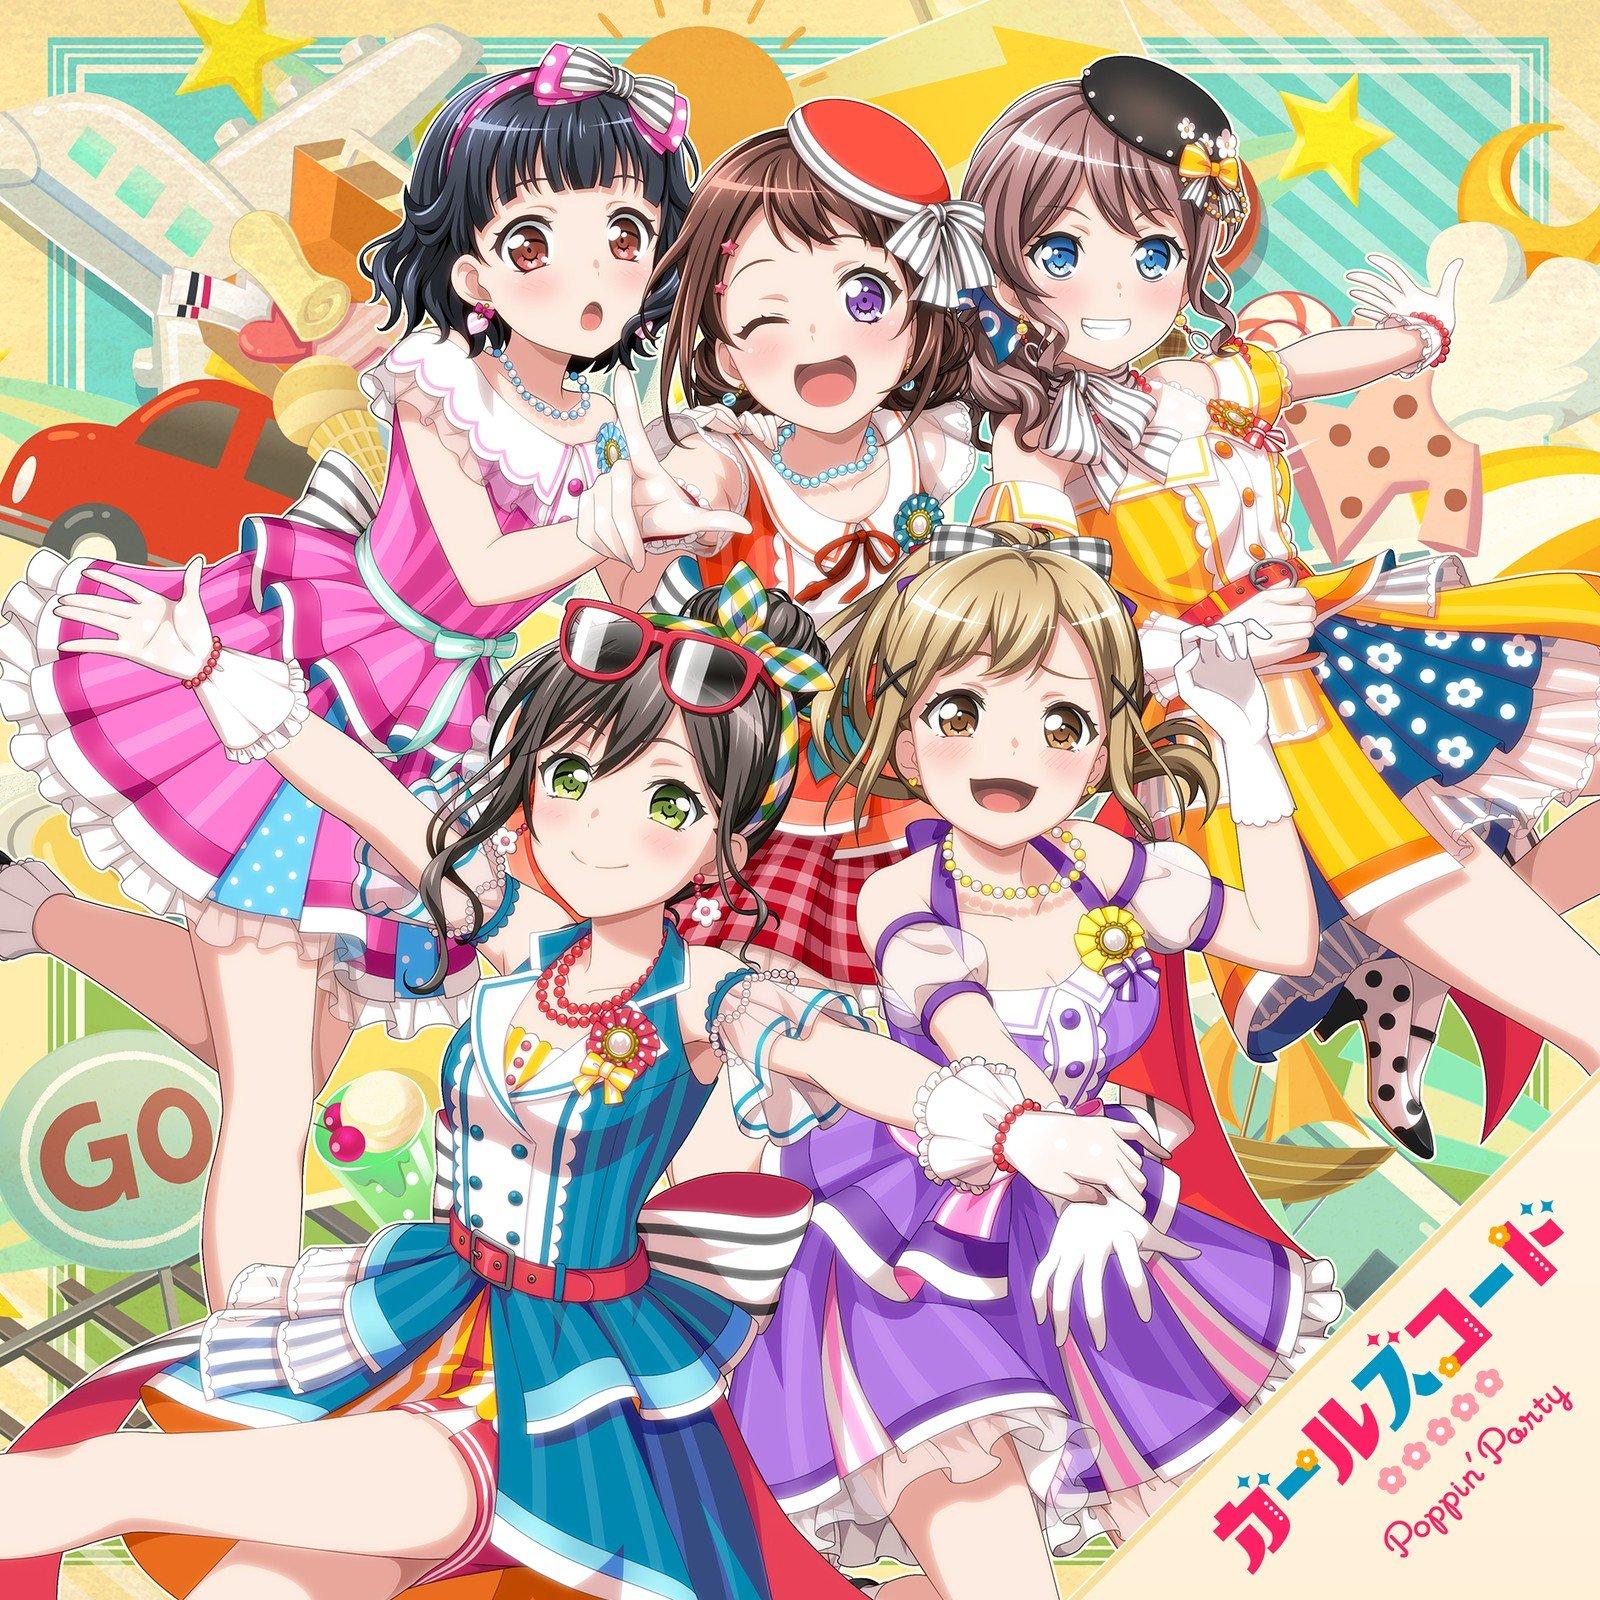 BanG Dream! / Poppin'Party – ガールズコード (Girls Code) [FLAC / 24bit Lossless / WEB] [2018.10.03]